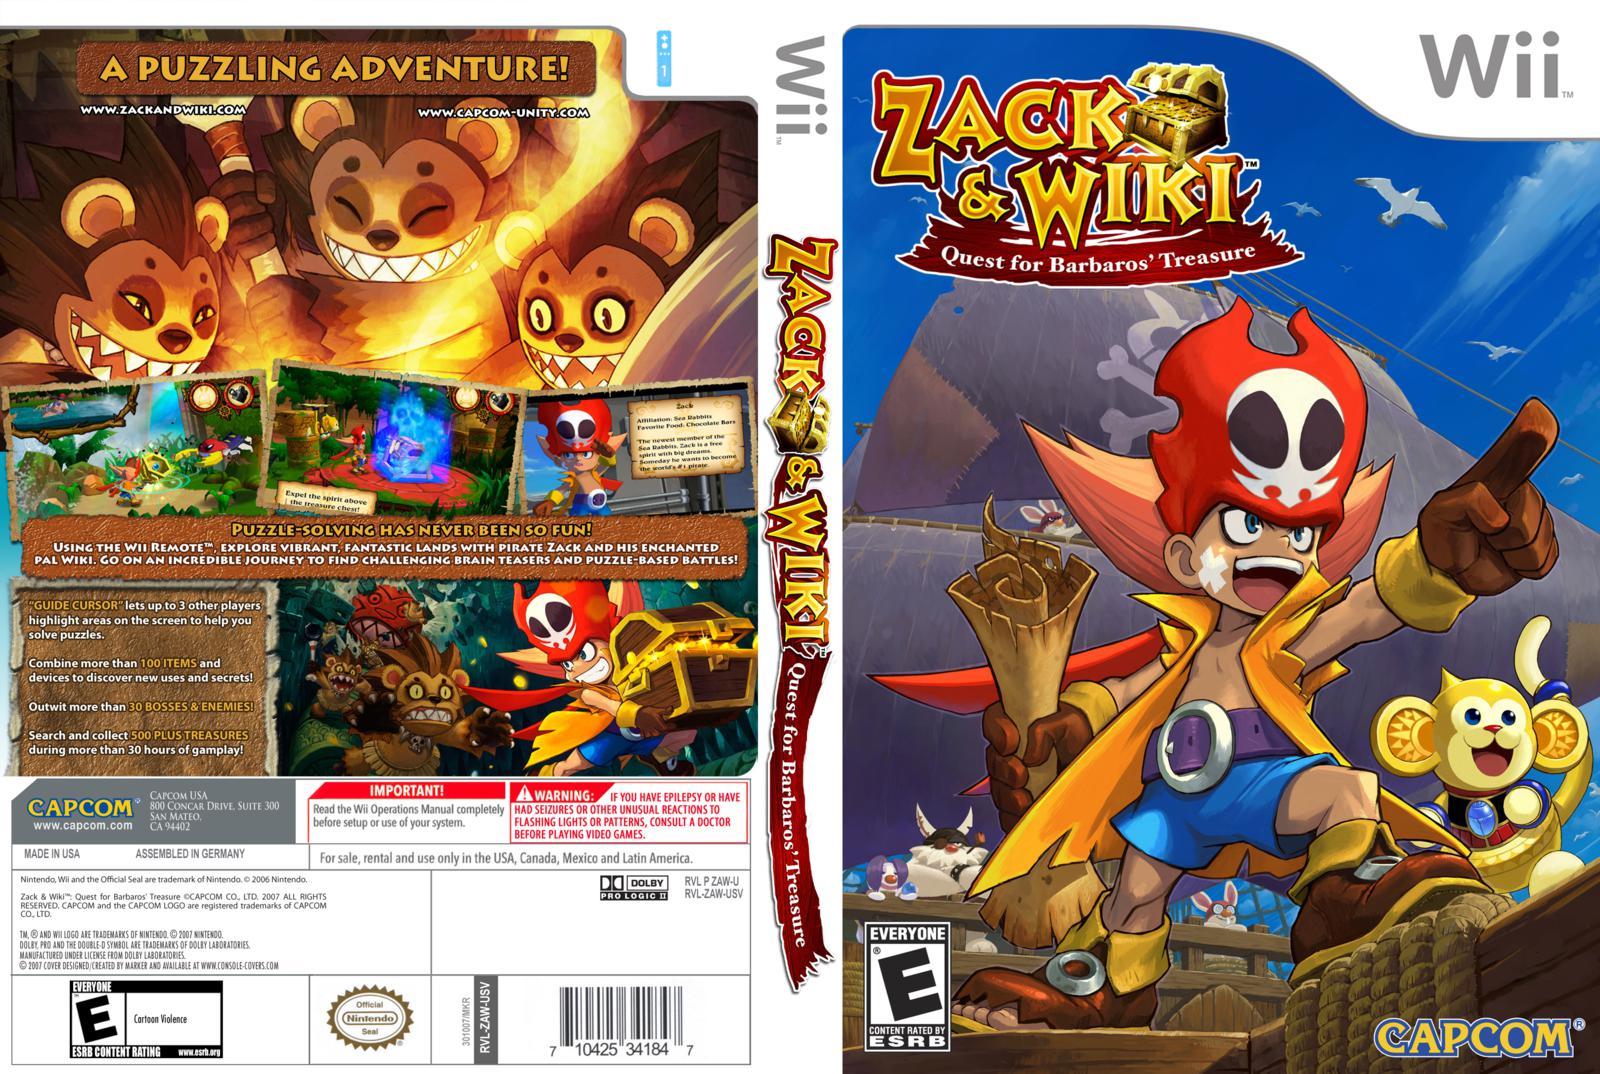 Games de Wii convertidos para Wii U  Zack+And+Wiki+Quest+For+Barbaros+Treasure+